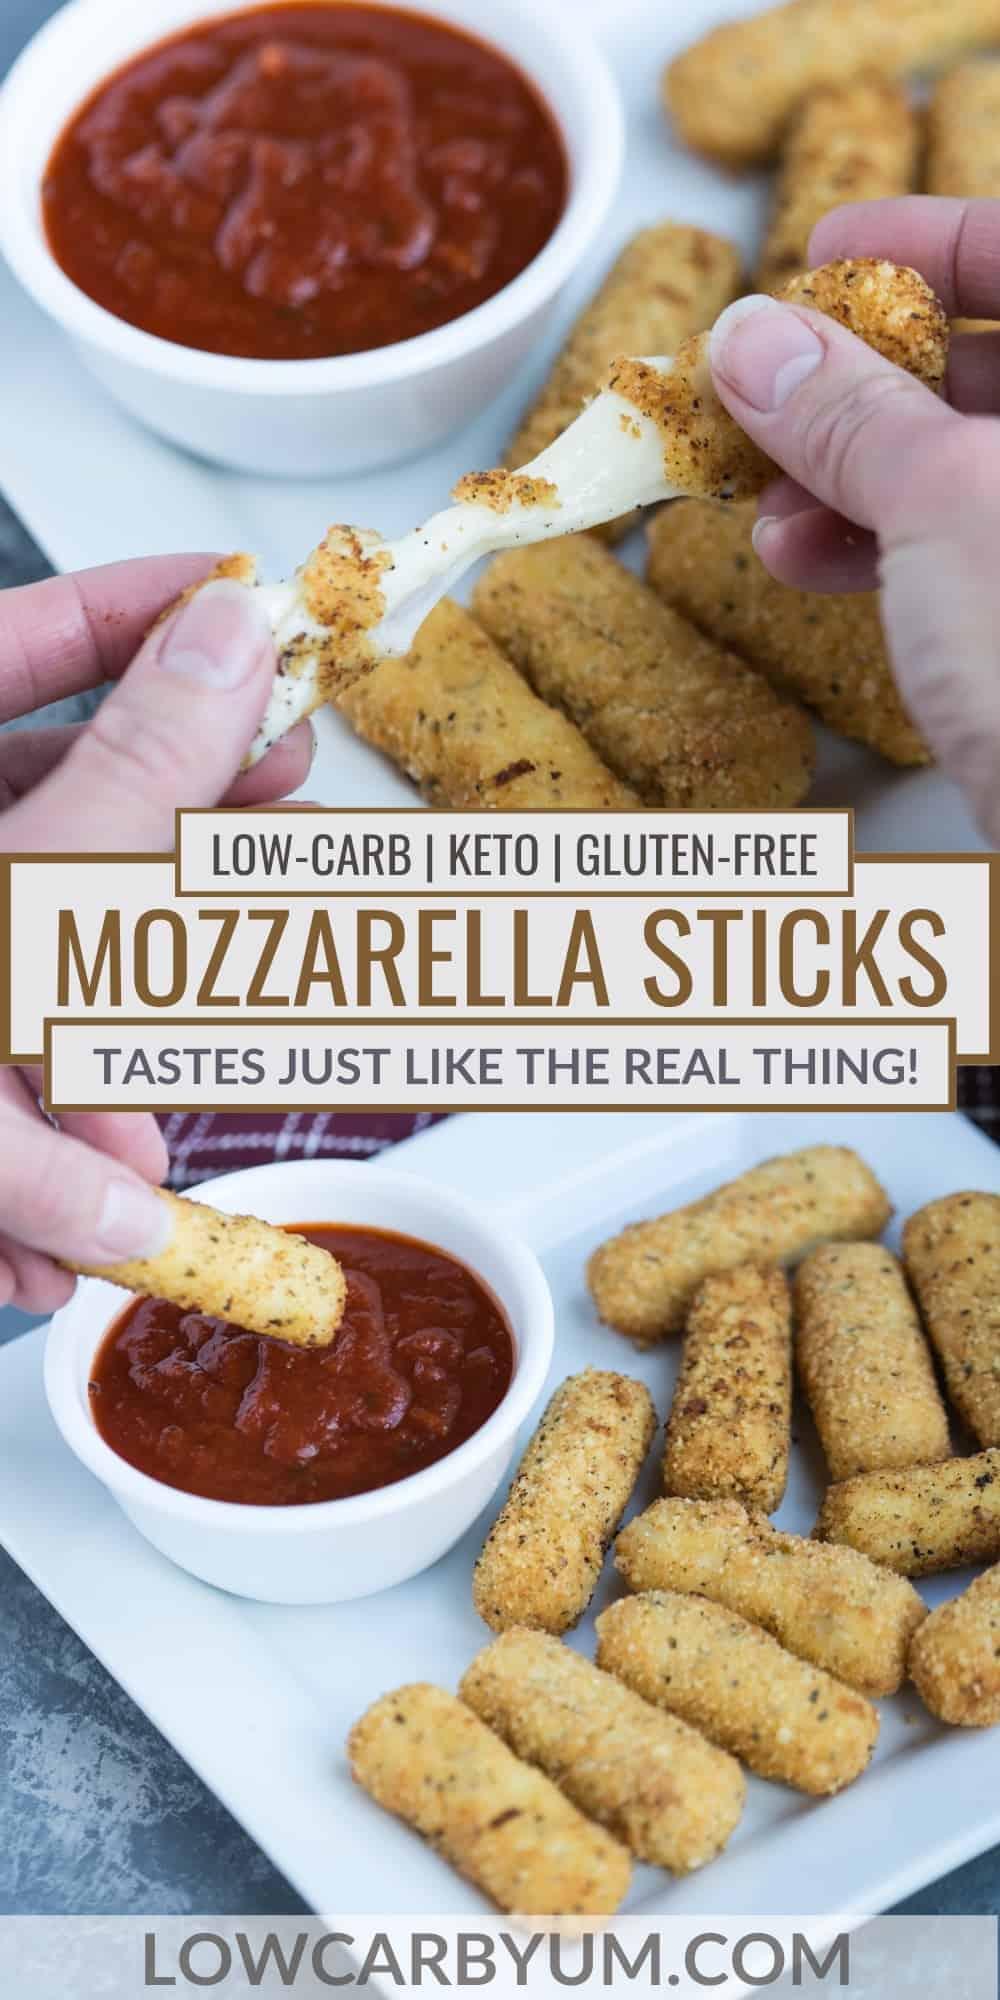 keto mozzarella sticks pinterest image